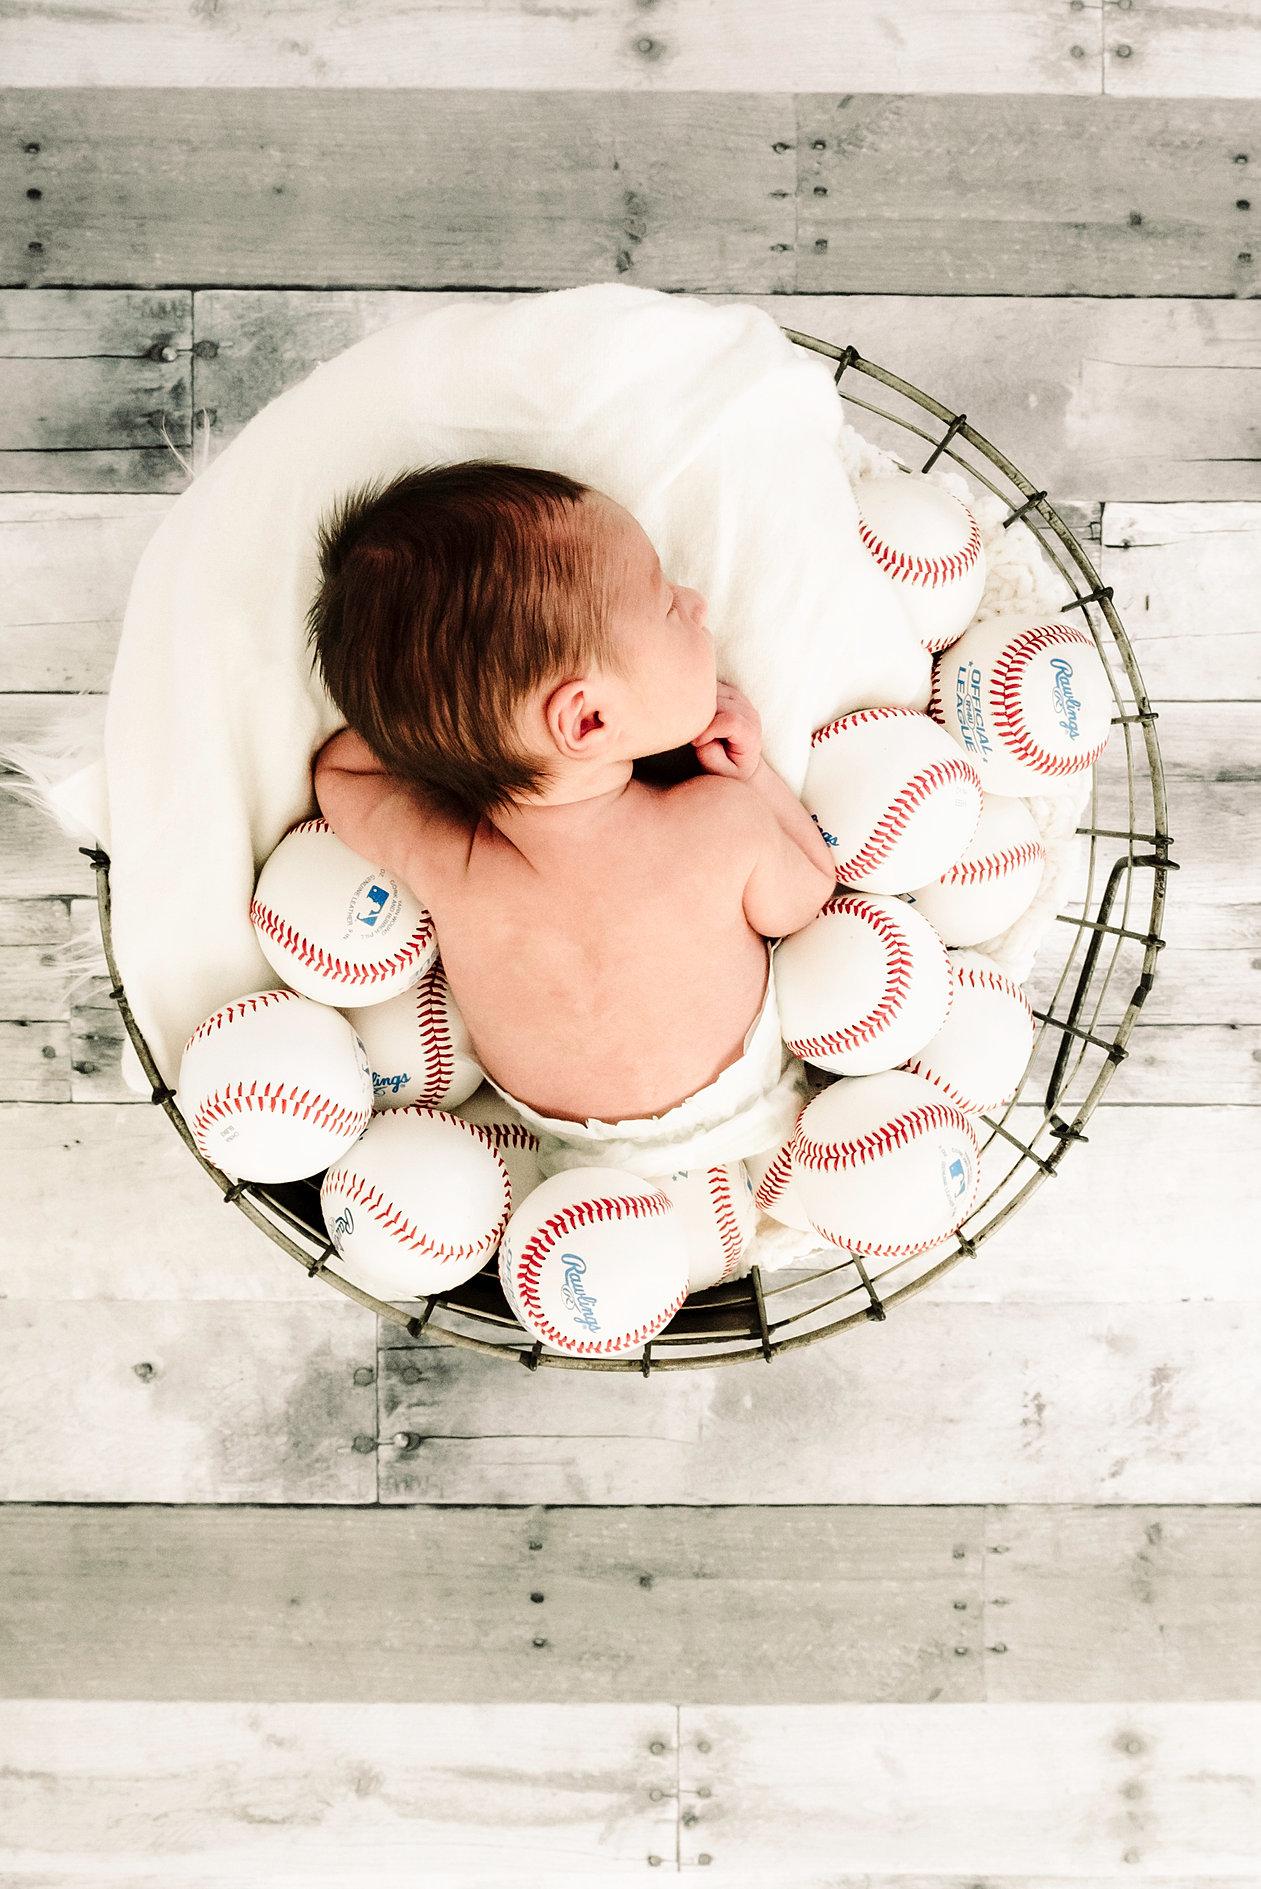 Phpmyadmin2014 - Phpmyadmin2015 Phpmyadmin2015 Syracuse Baby Clothes Newborn Photography Syracuse